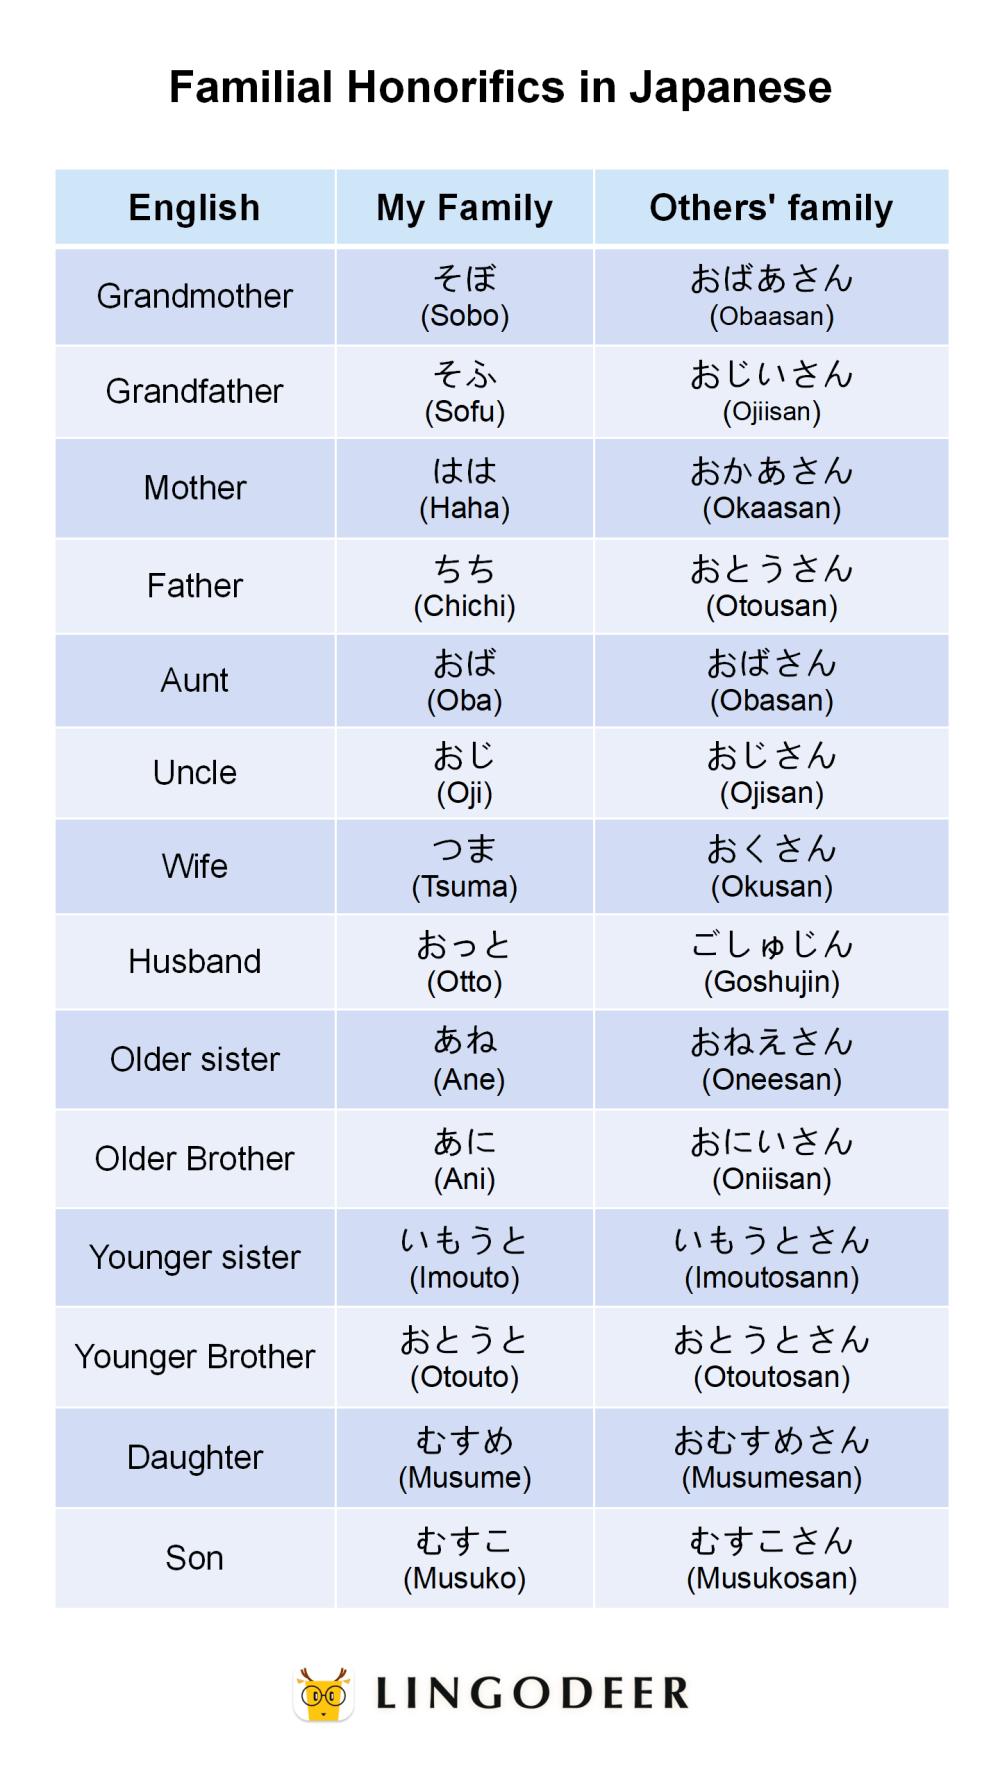 Familial Honorifics in Japanese